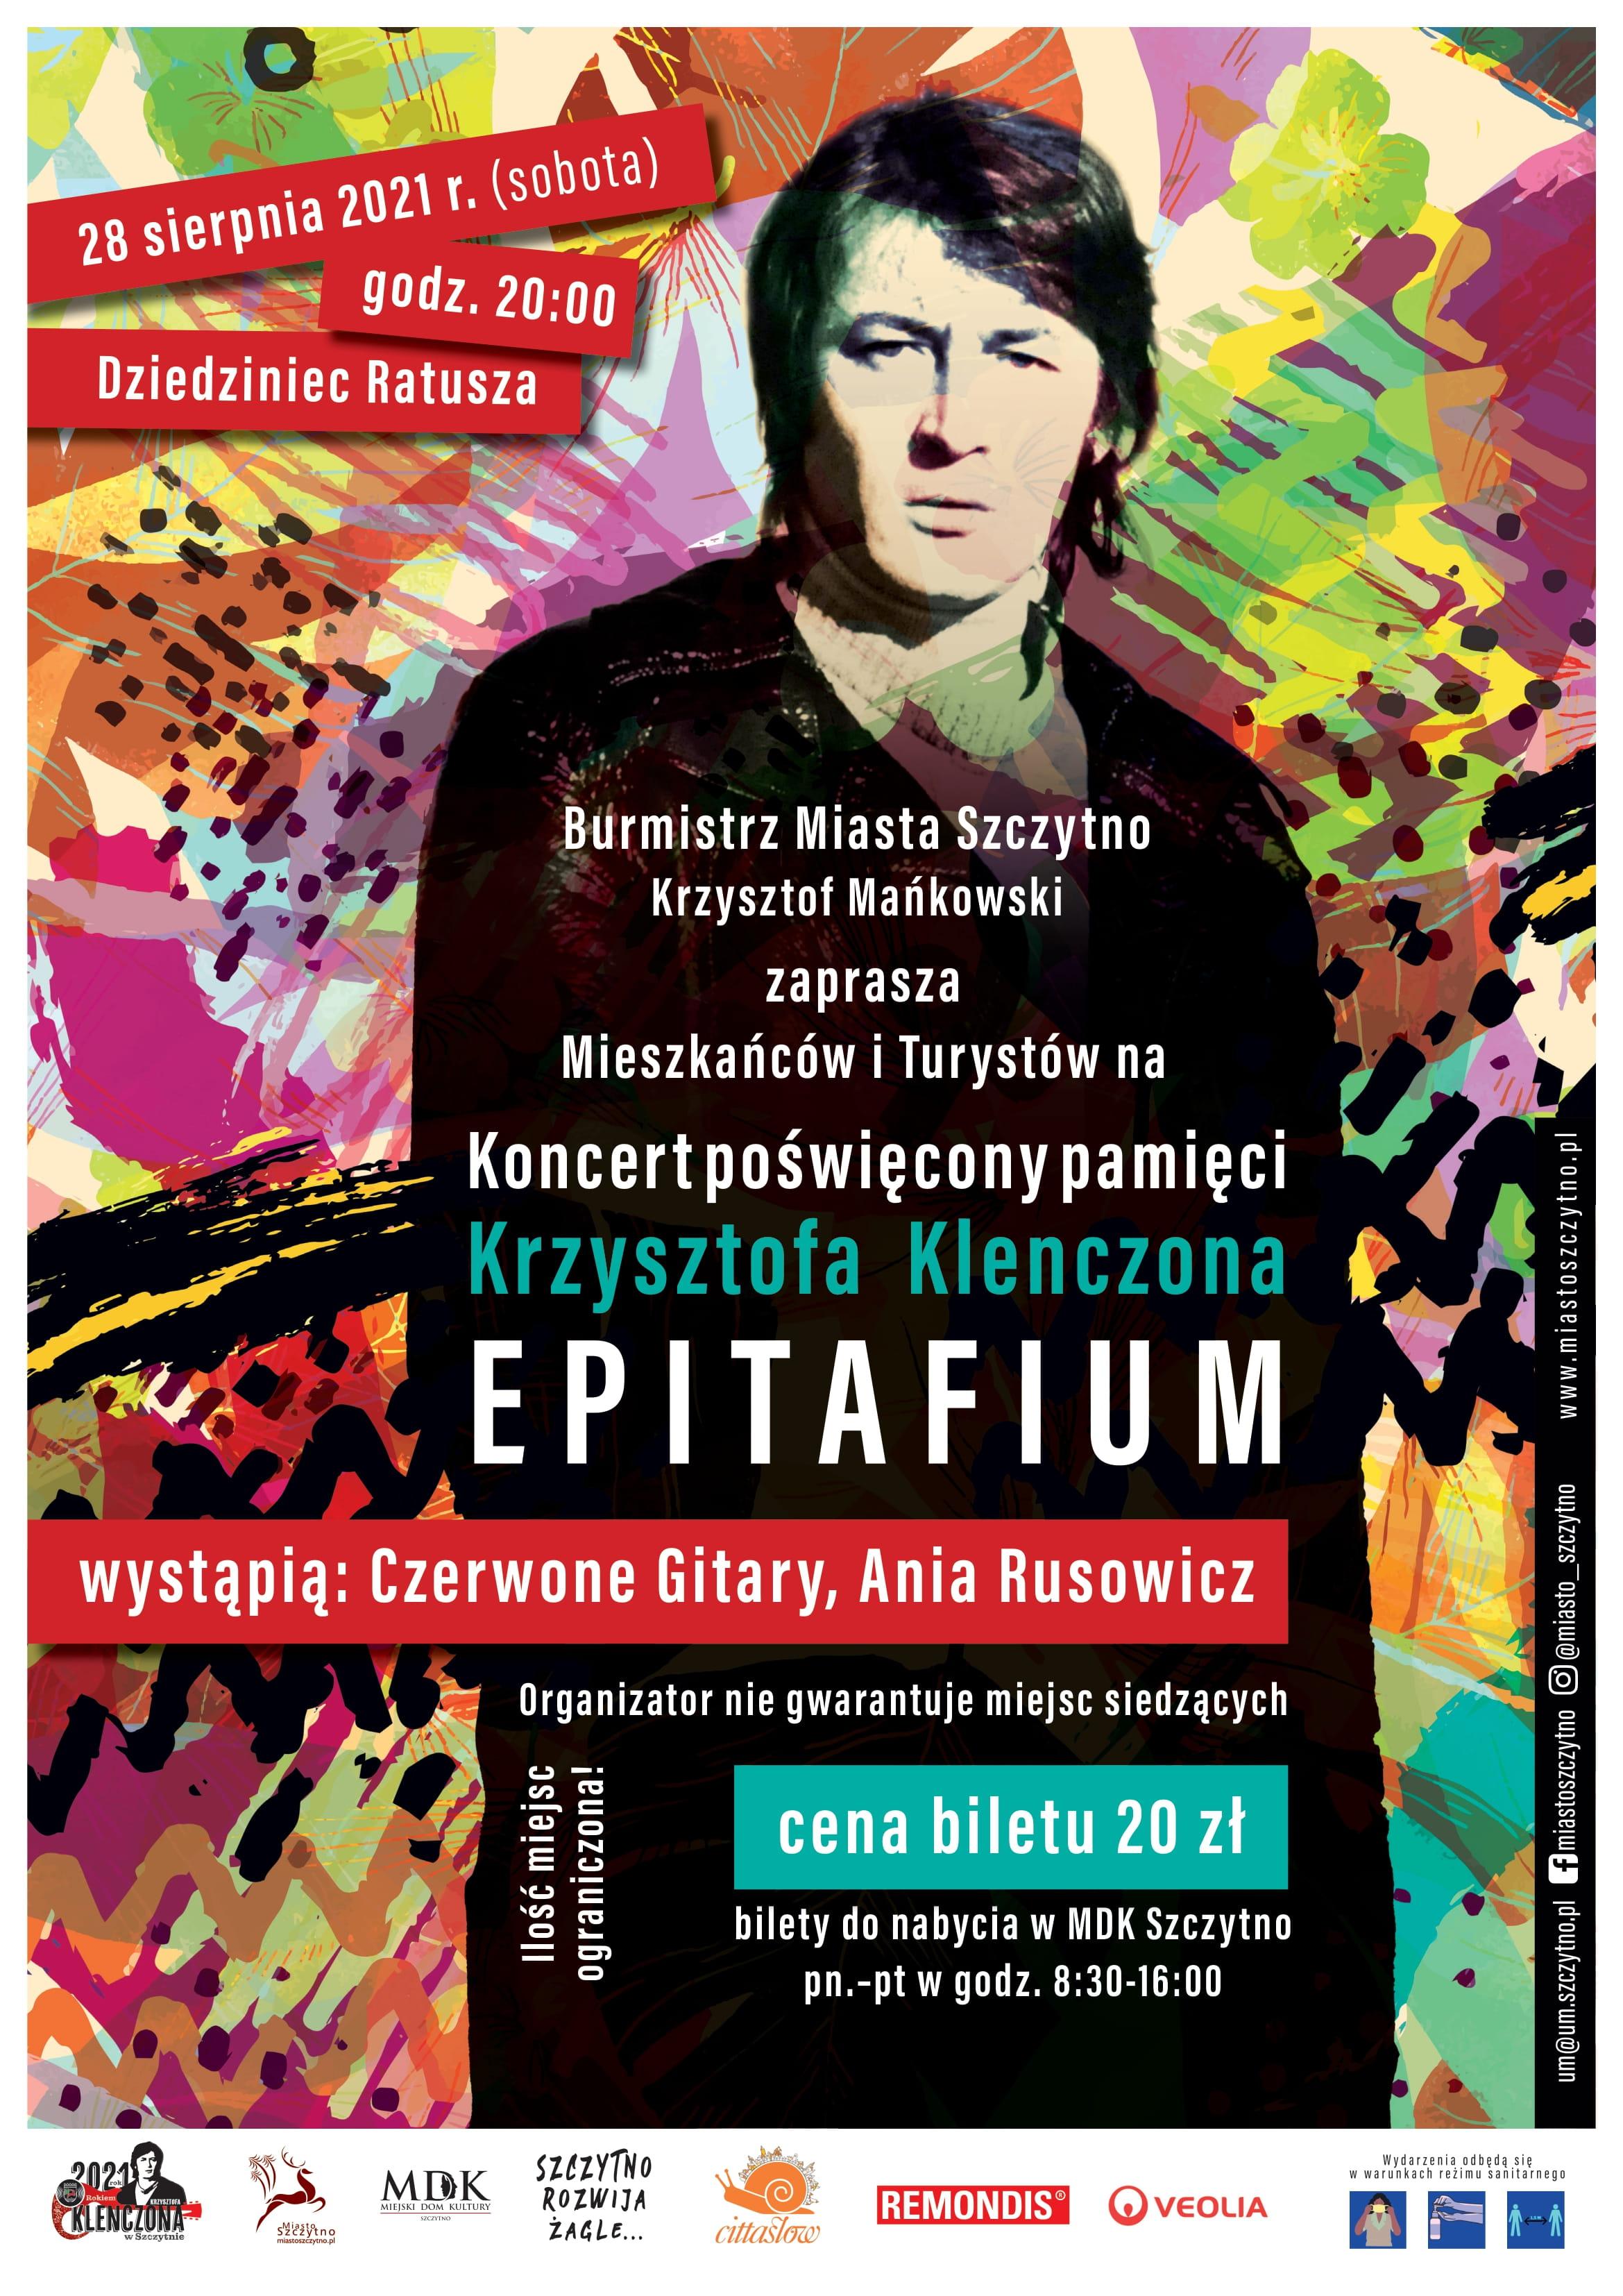 https://m.powiatszczycienski.pl/2021/08/orig/um-plakat-a3-epitafium-1-42603.jpg